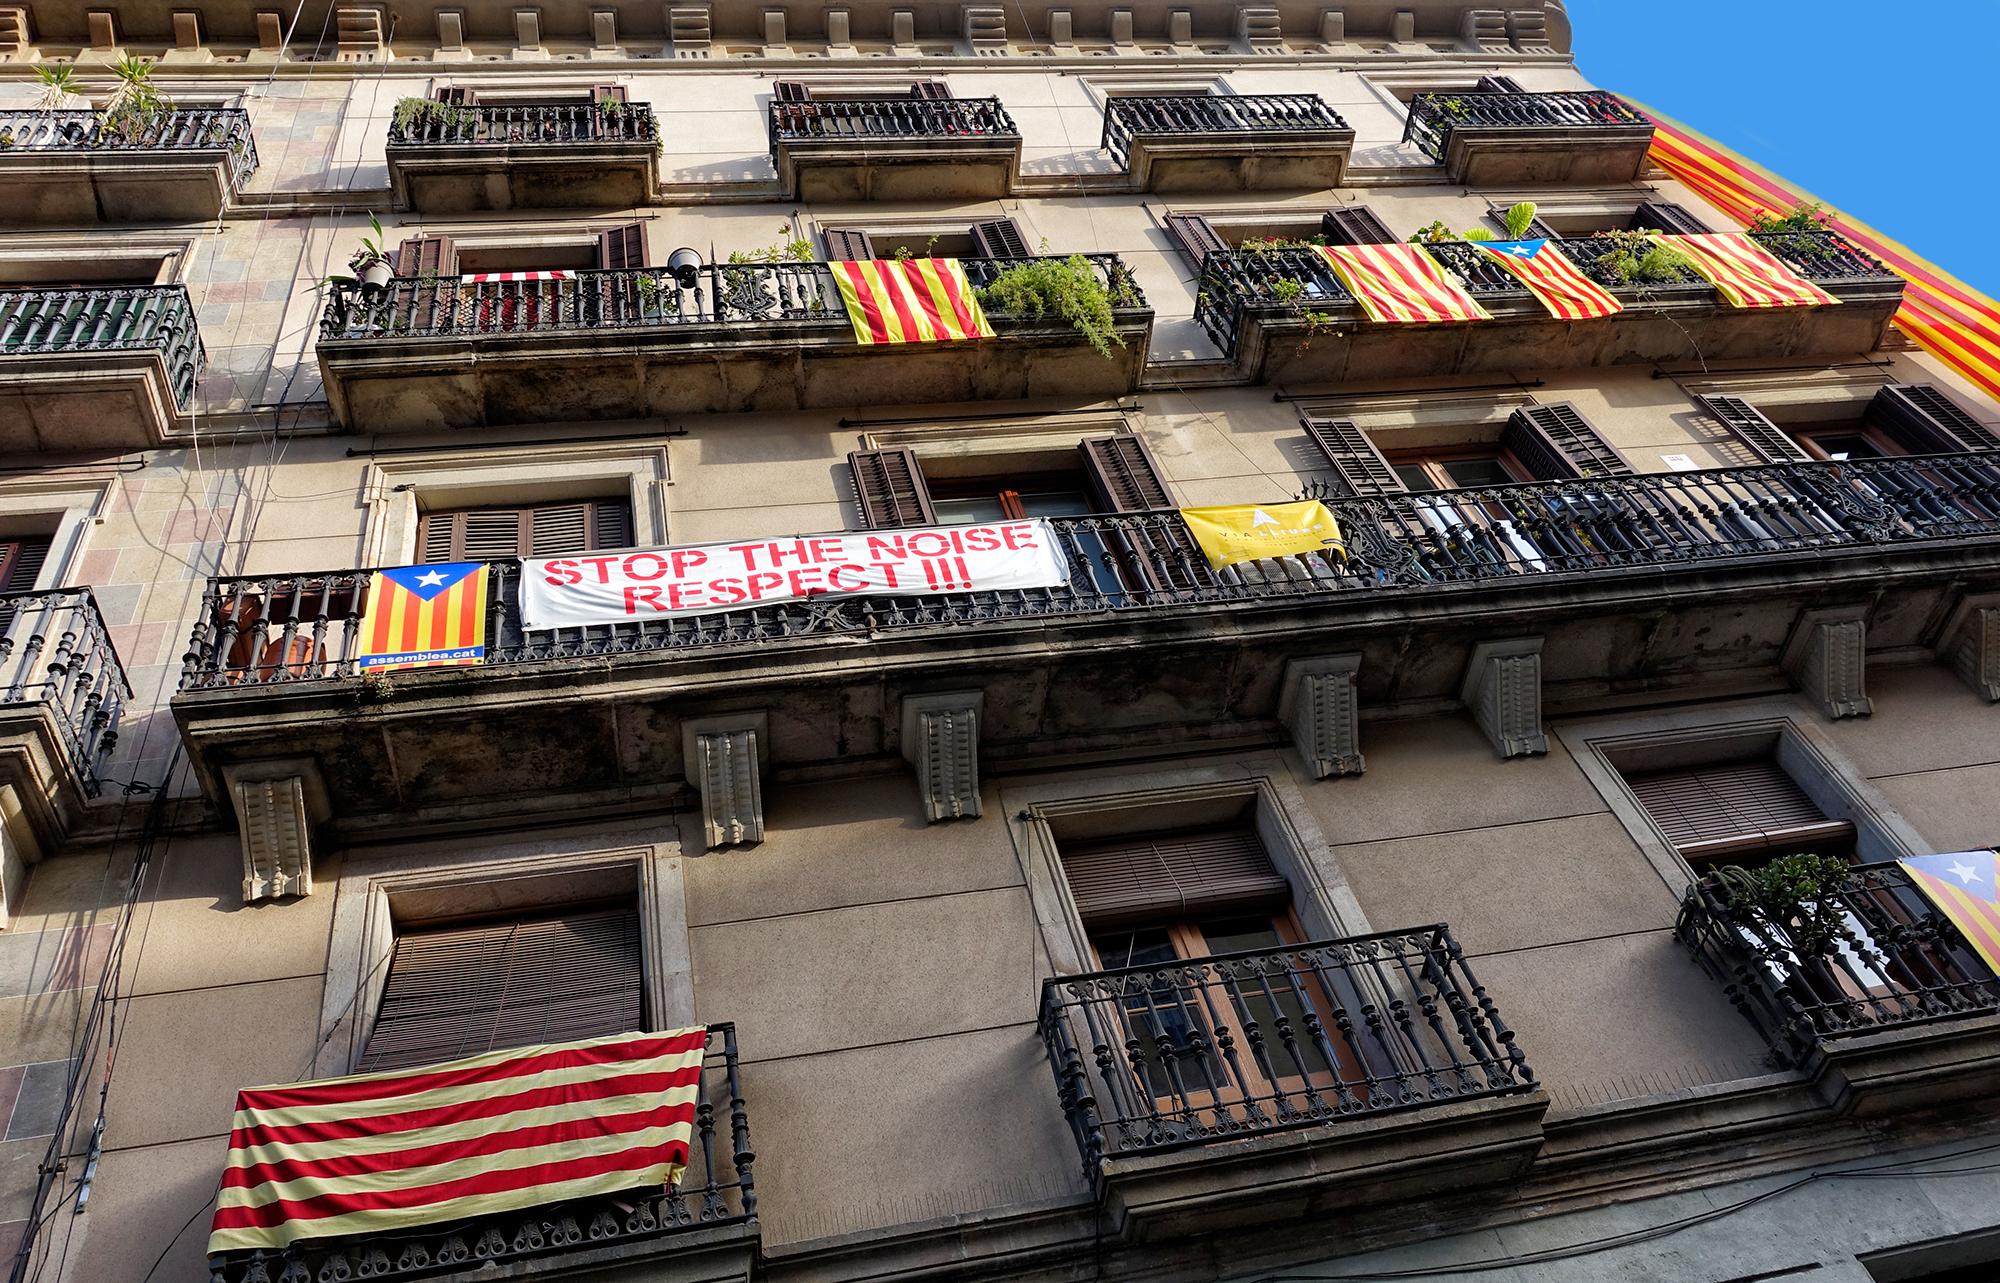 Stop the Noise! Near a Barcelona tourist area, 2015